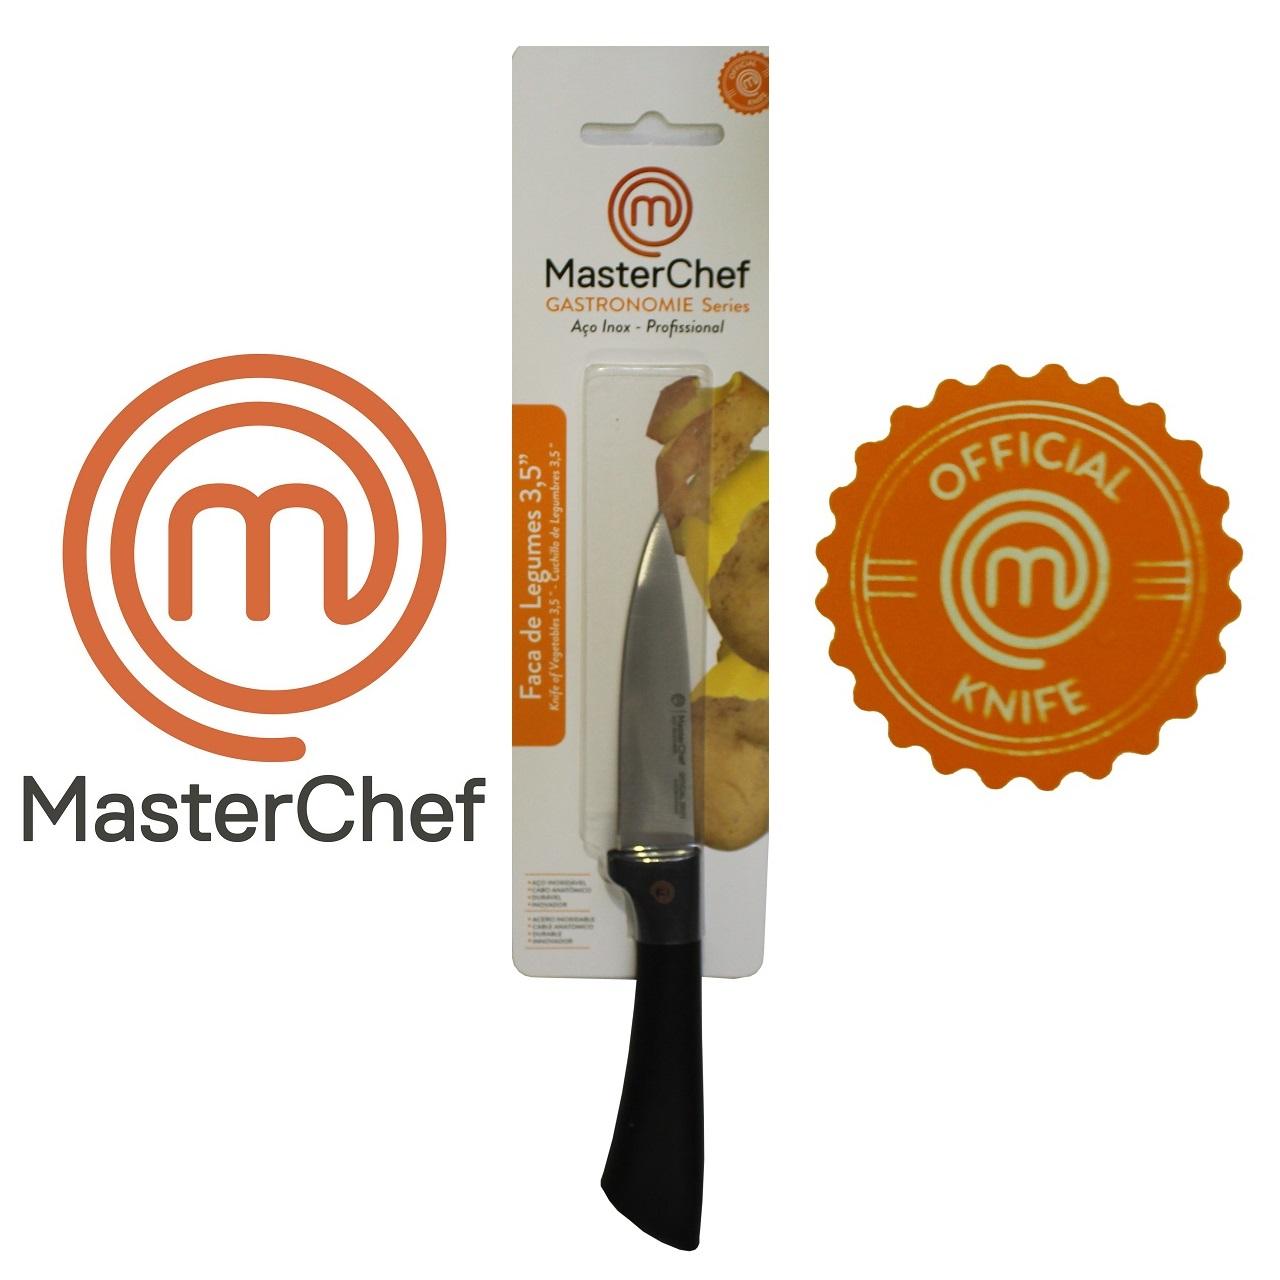 Kit 4 Facas + Afiador Gastronomie MasterChef